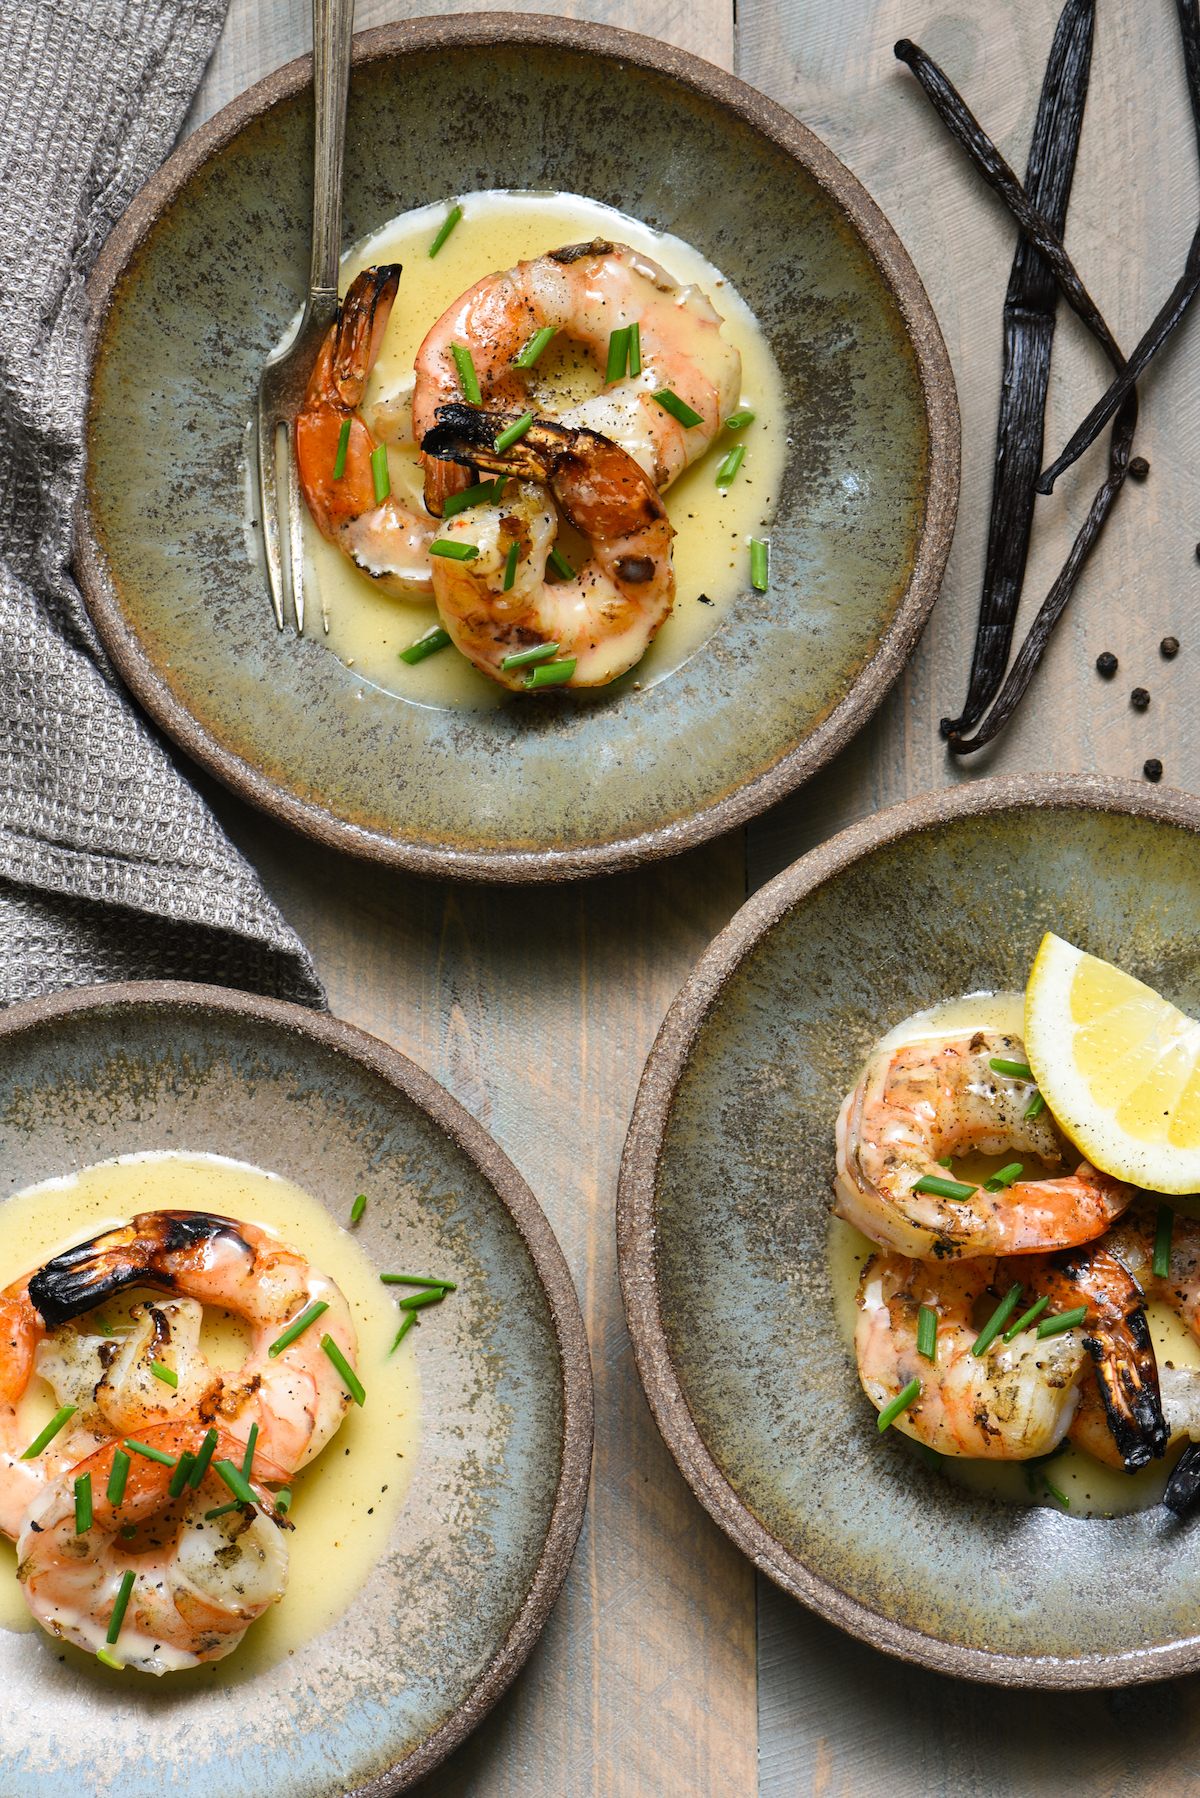 Dessert Bowls - Moonshadow - Lori Yates - Grilled-Shrimp-with-Vanilla-Beurre-Blanc.jpg